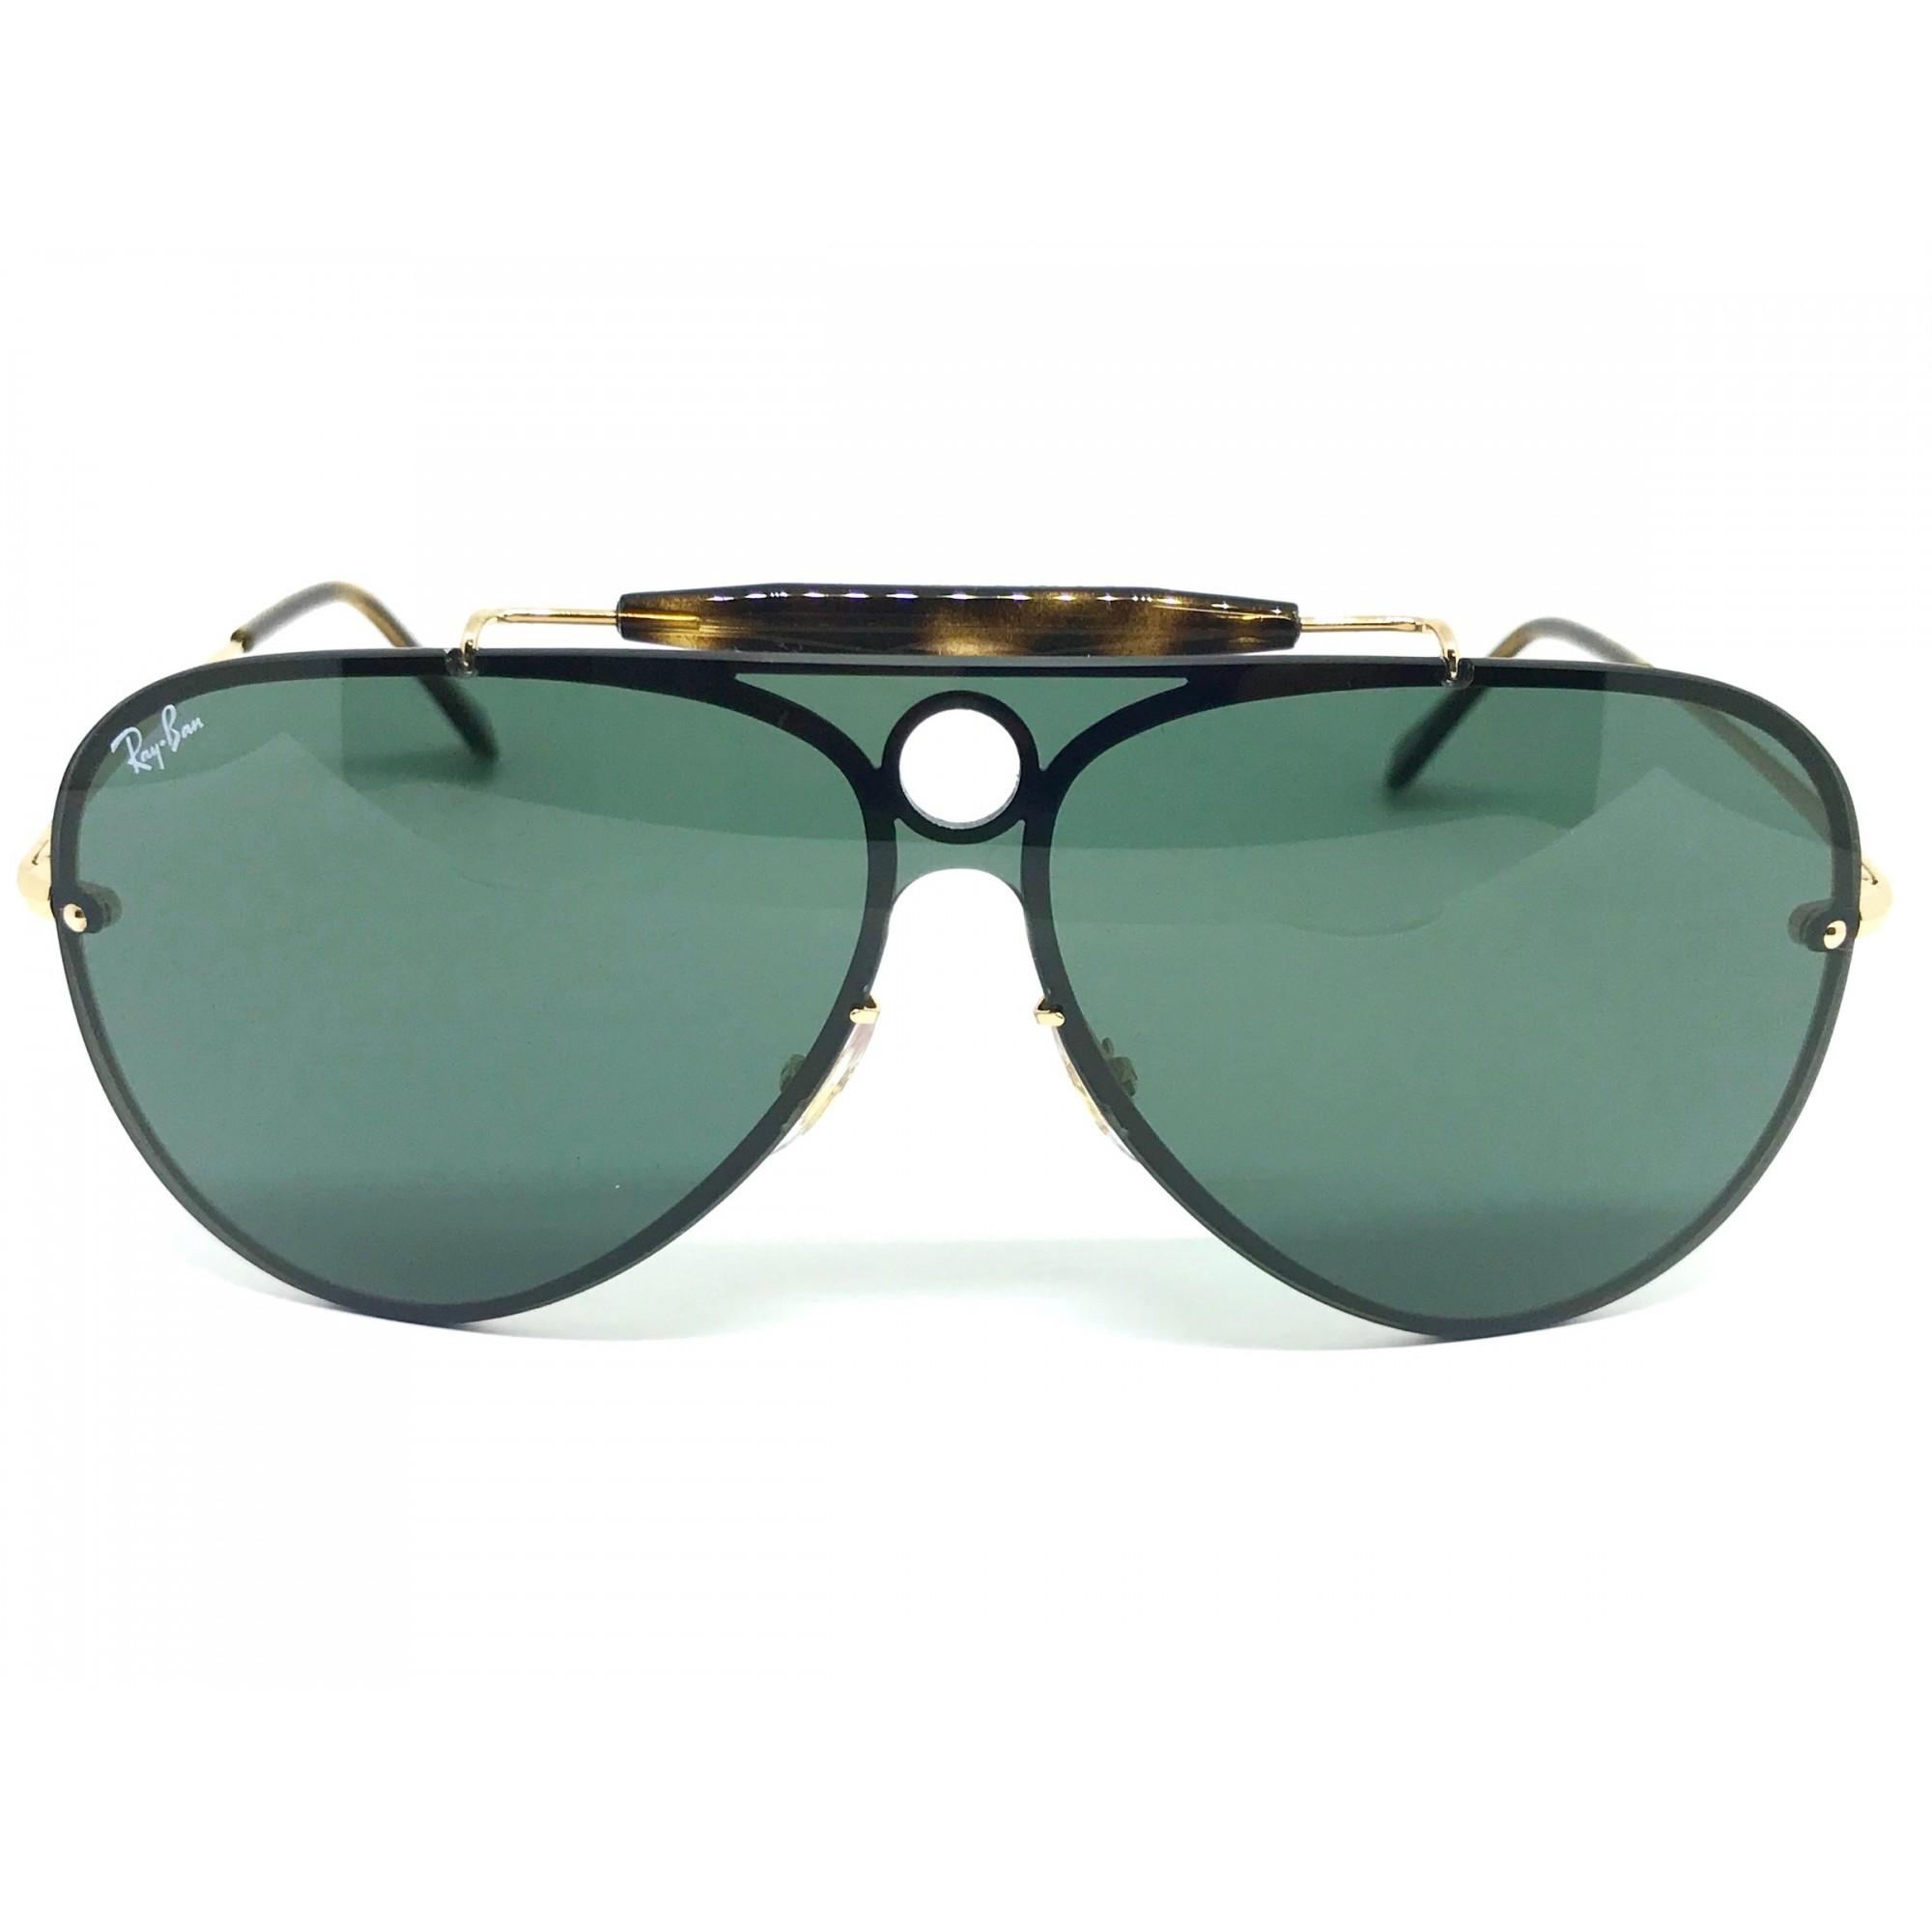 bcd3990e7ffb2 Oculos de sol Ray Ban Aviador Blaze Shooter RB 3581N 001 71 32